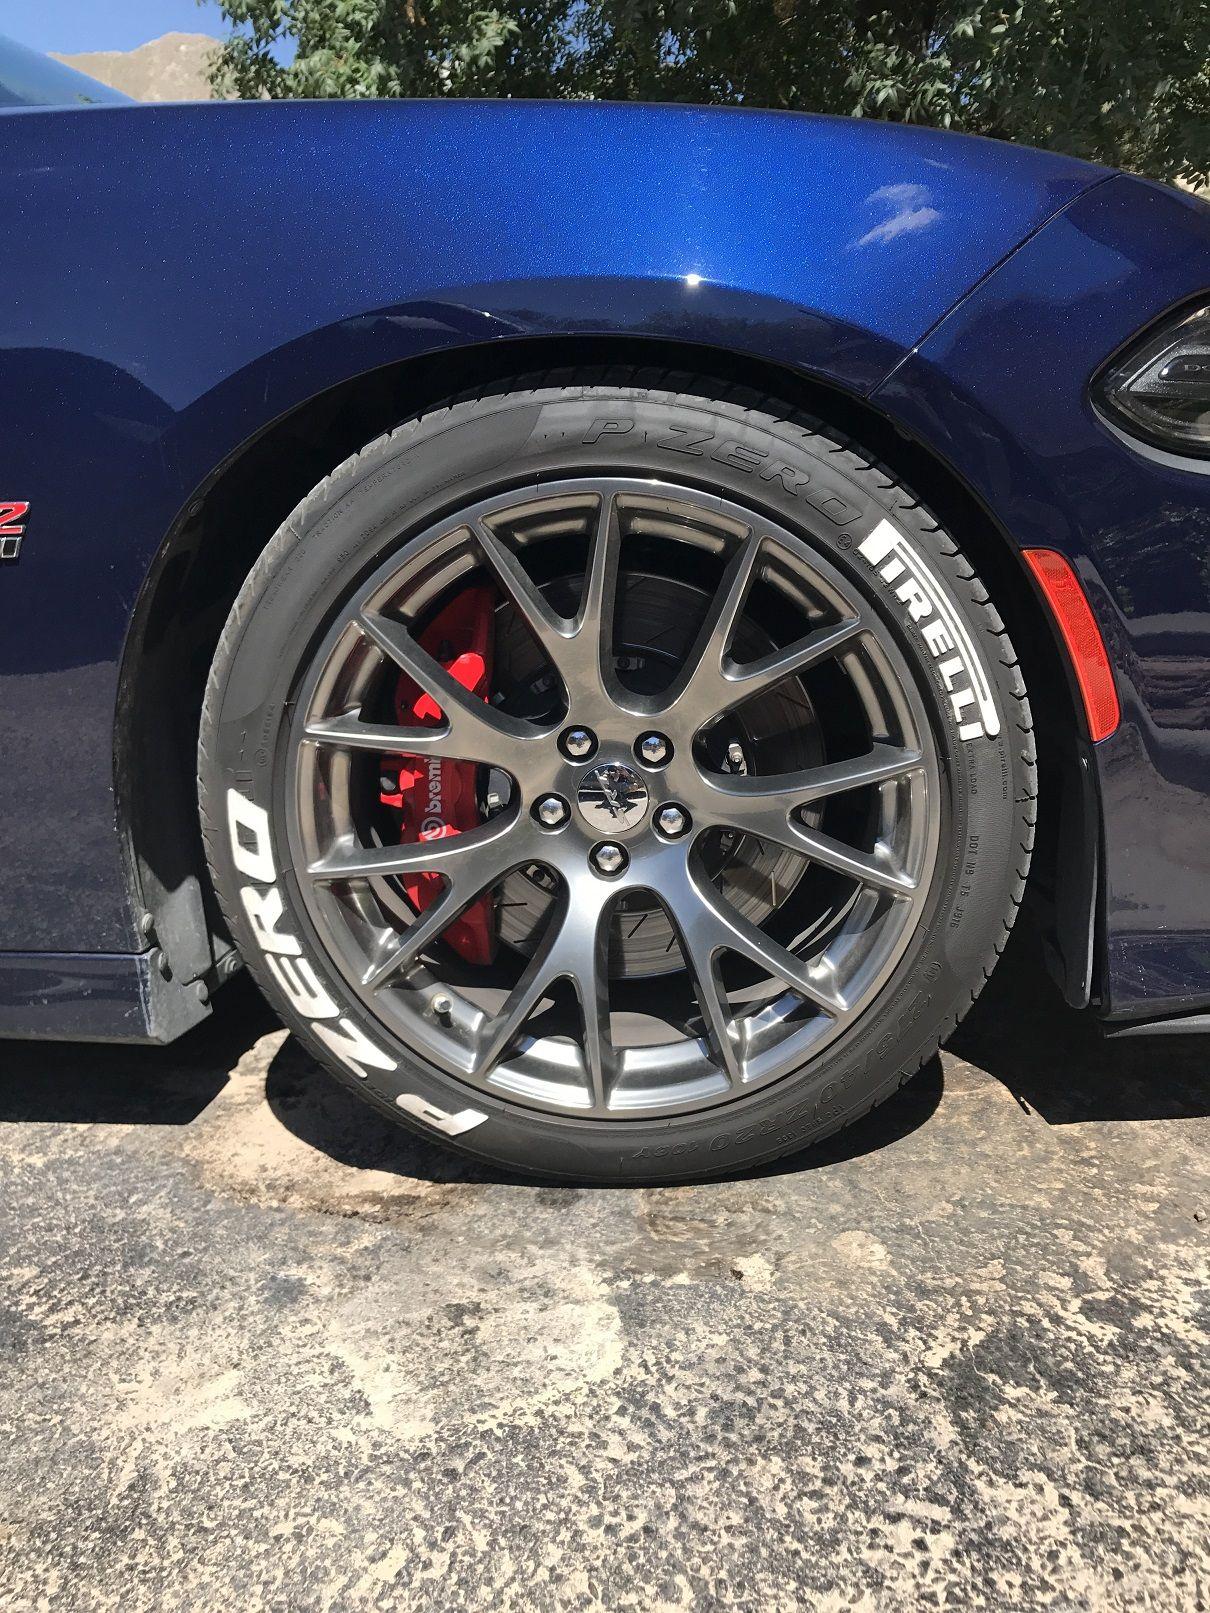 Pirelli P Zero 1 25 Set Of8 Https Www Etsy Com Listing 603050832 Race Font 1 Bridgestone Potenza Red Logo Ref Listings Manager Grid Tire Pirelli Vintage [ 1613 x 1210 Pixel ]